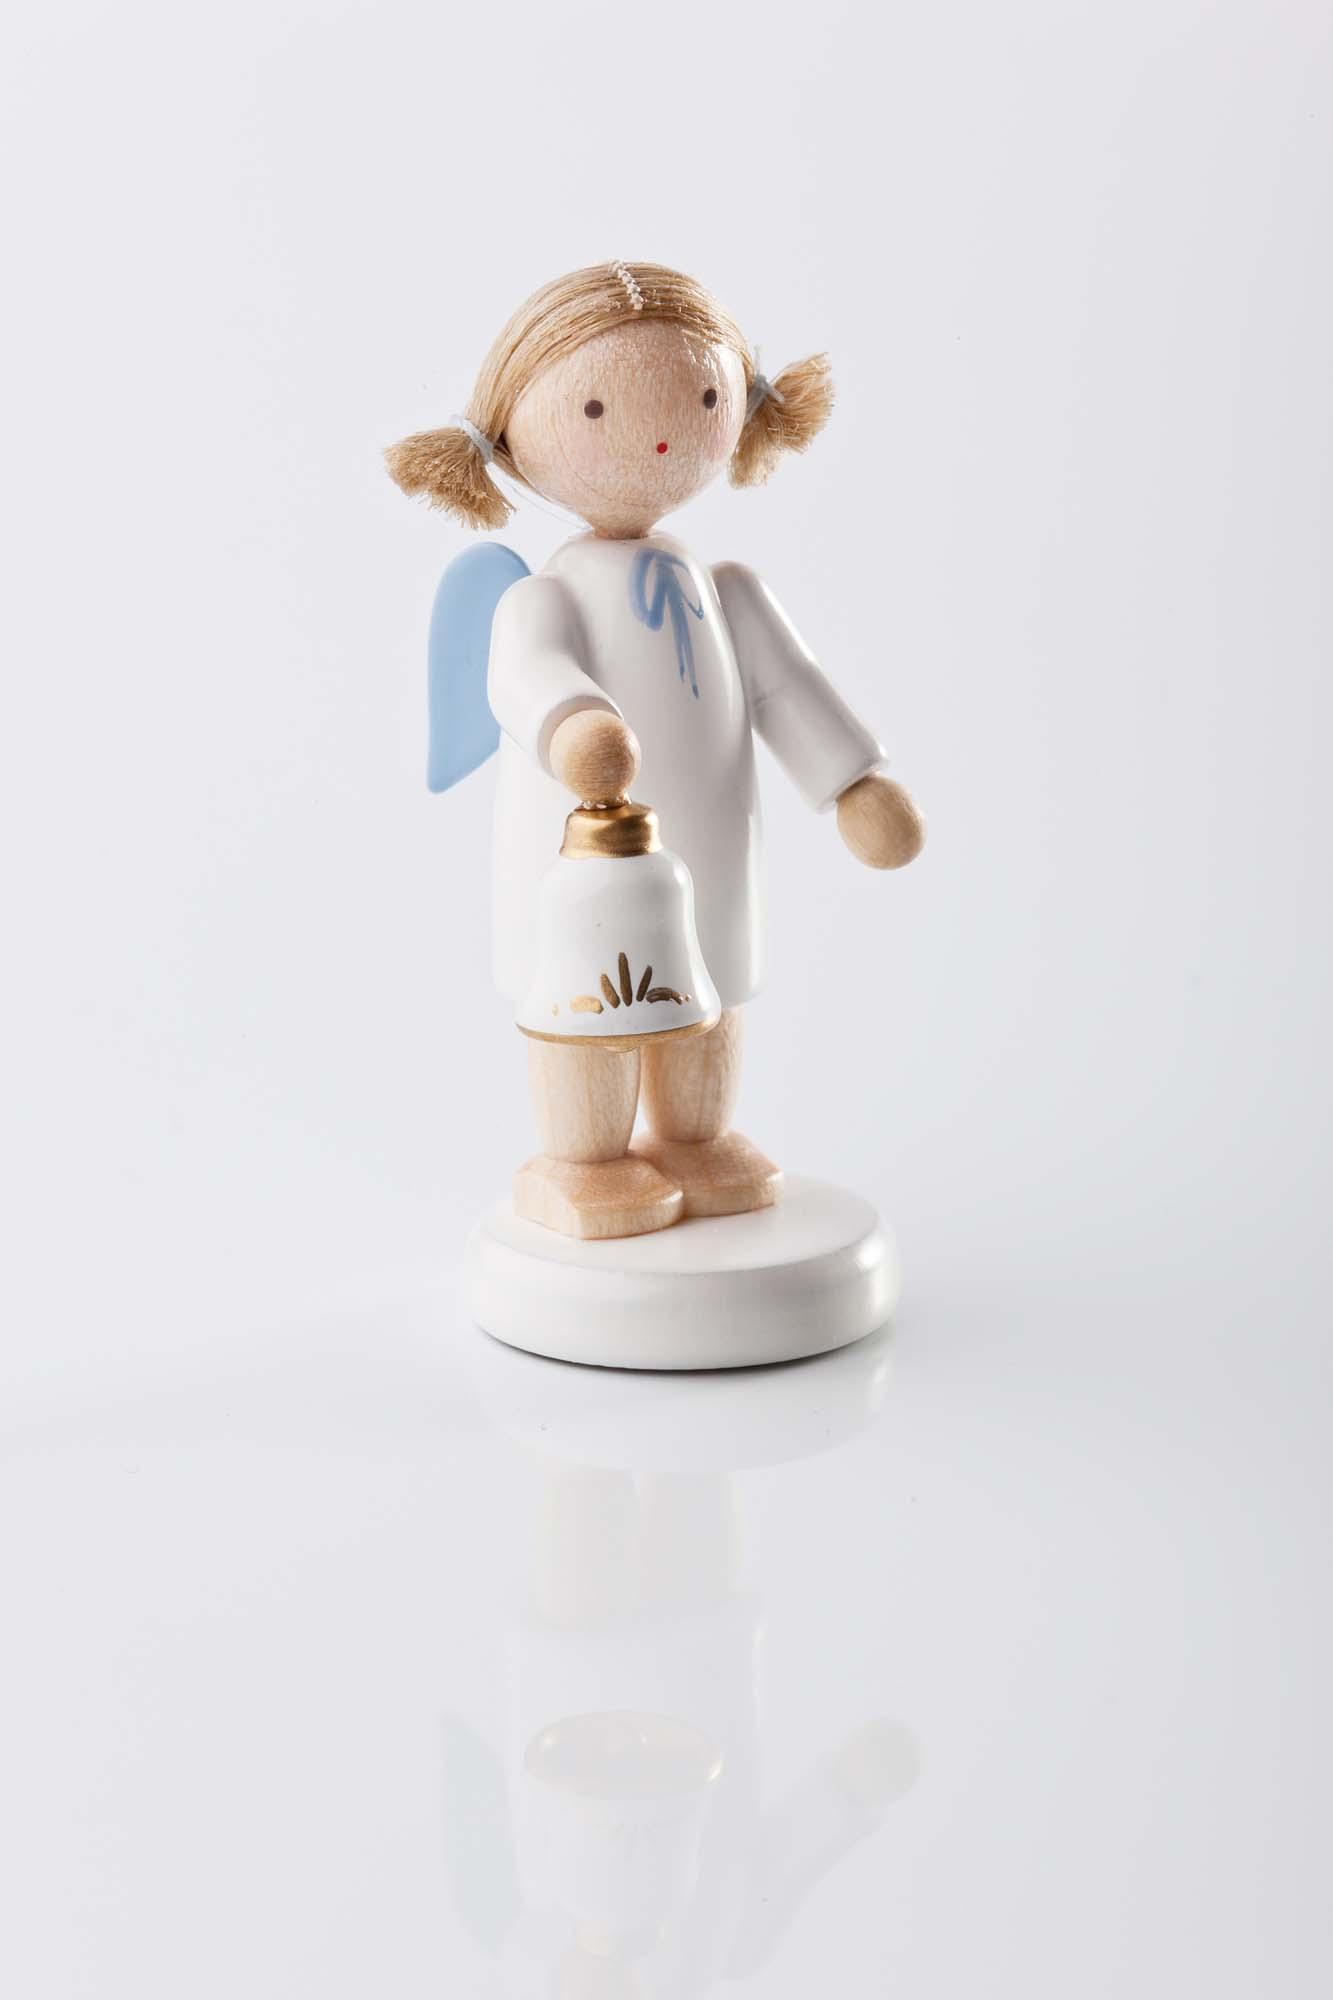 Engel mit Glocke 6117